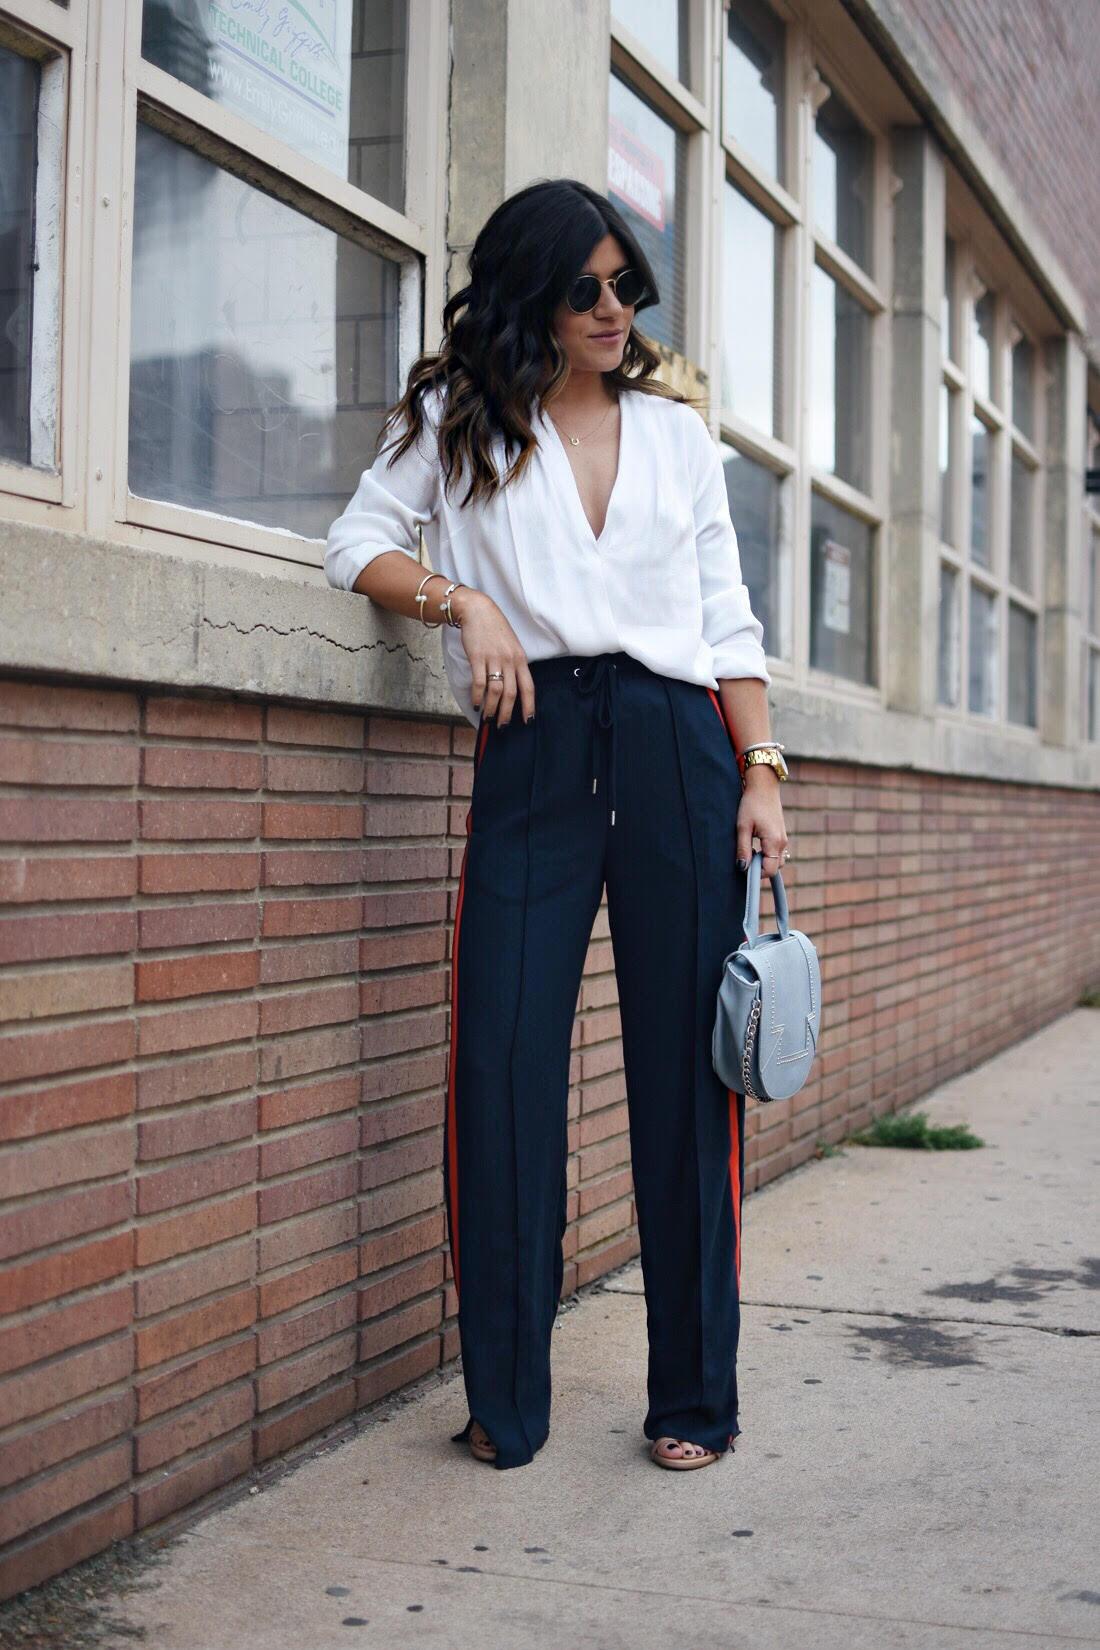 Carolina Hellal of the fashion blog chic talk wearing H&M navy blue track pants